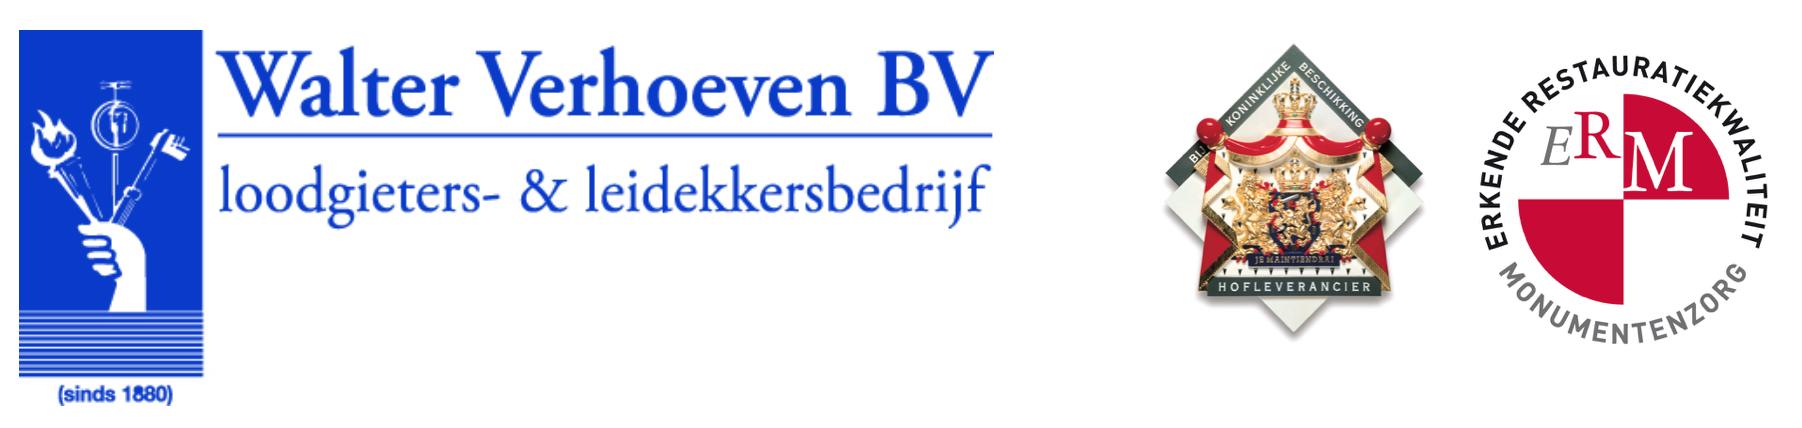 Walter Verhoeven BV